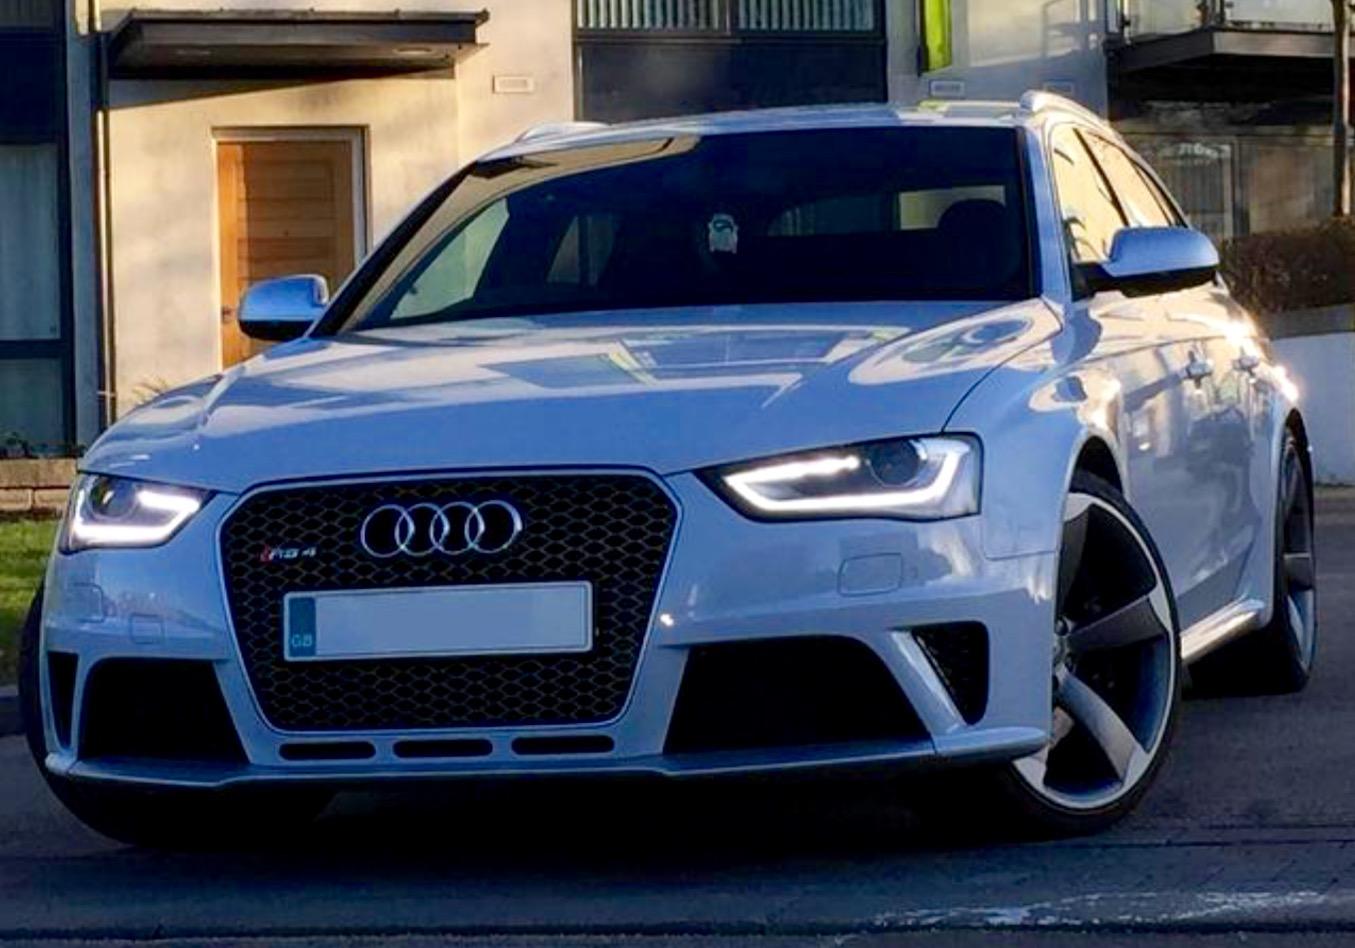 Audi S4rs4 Conversion Worth The Money Audi Sportnet